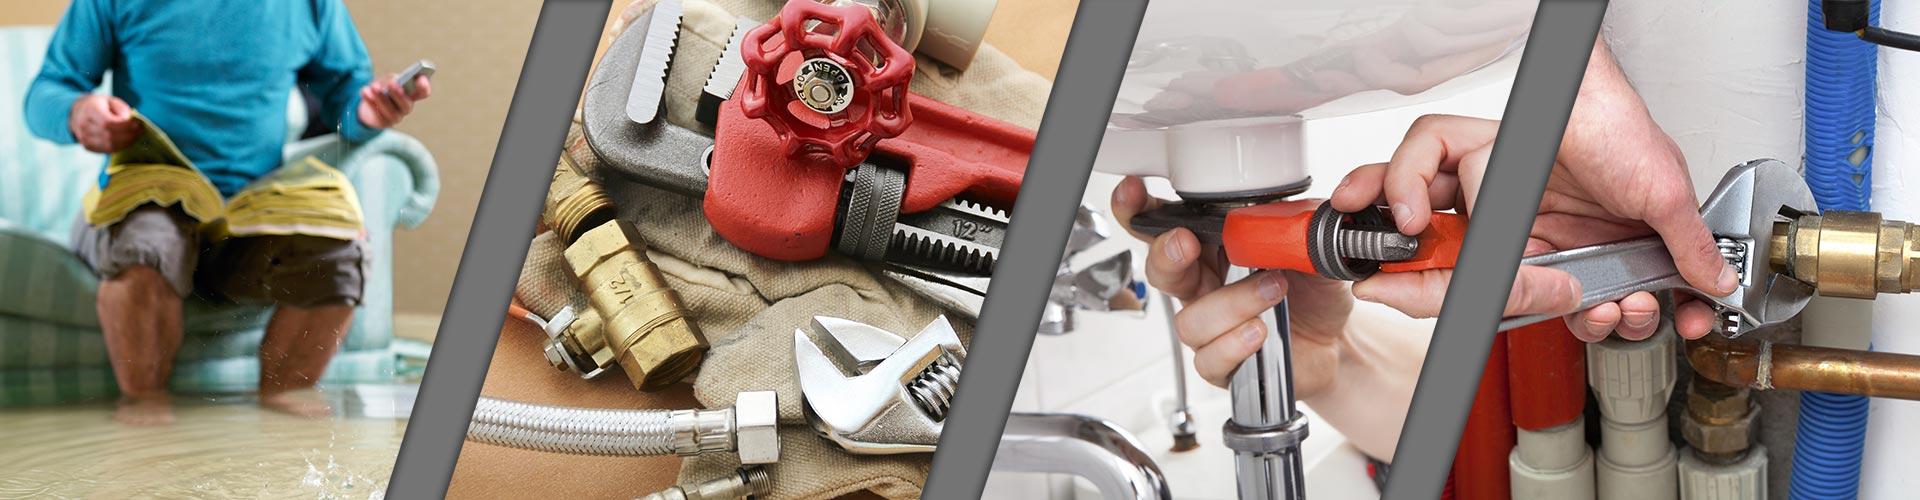 joniec plumbing gas fitting tools equipments and emergency plumbing